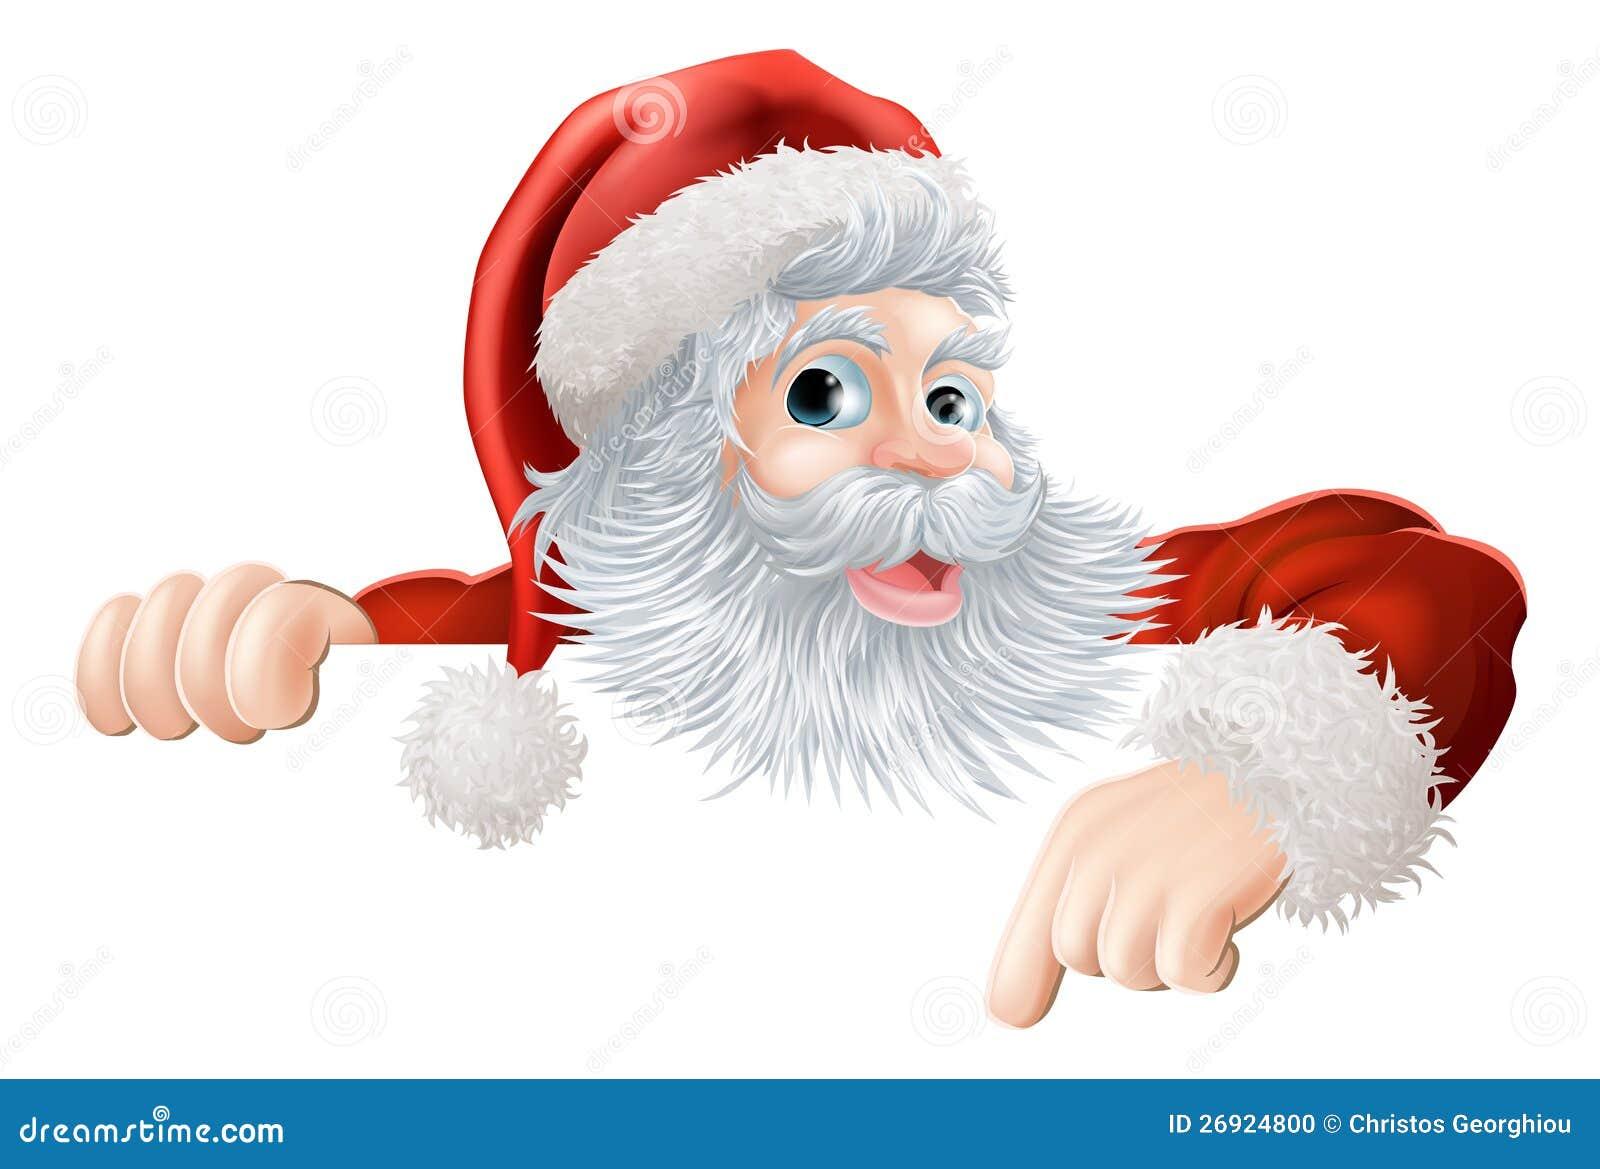 Arrow Pointing Down >> Christmas Santa Pointing Down At Sign Stock Photo - Image ...